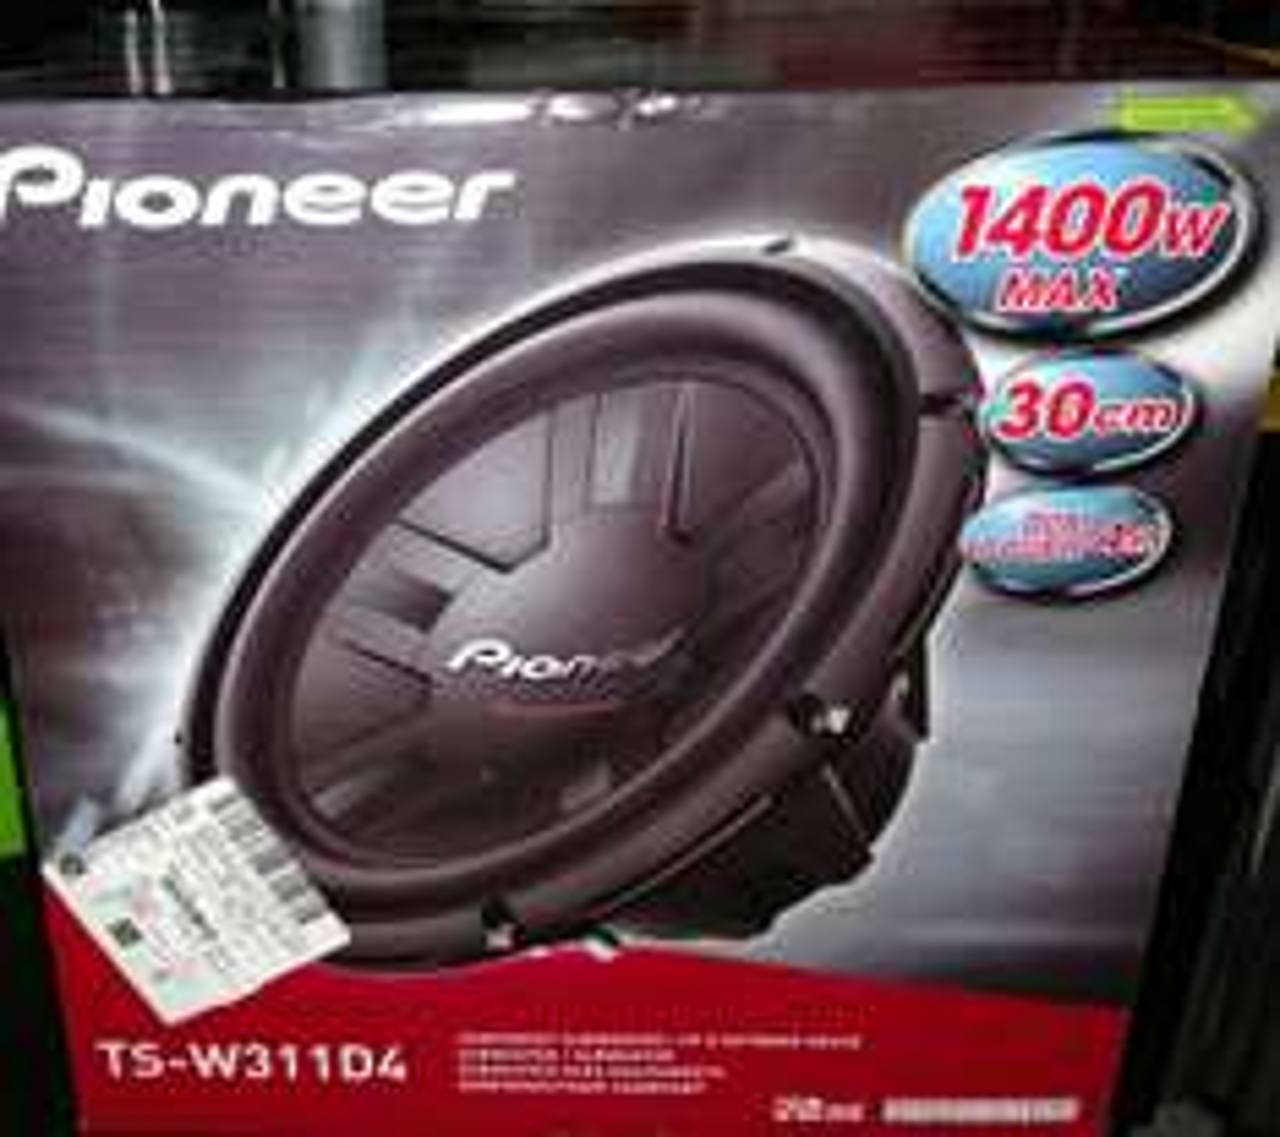 Walmart Poligono: Subwoofer Pioneer 1400 watts 30 cms a $629 pesos